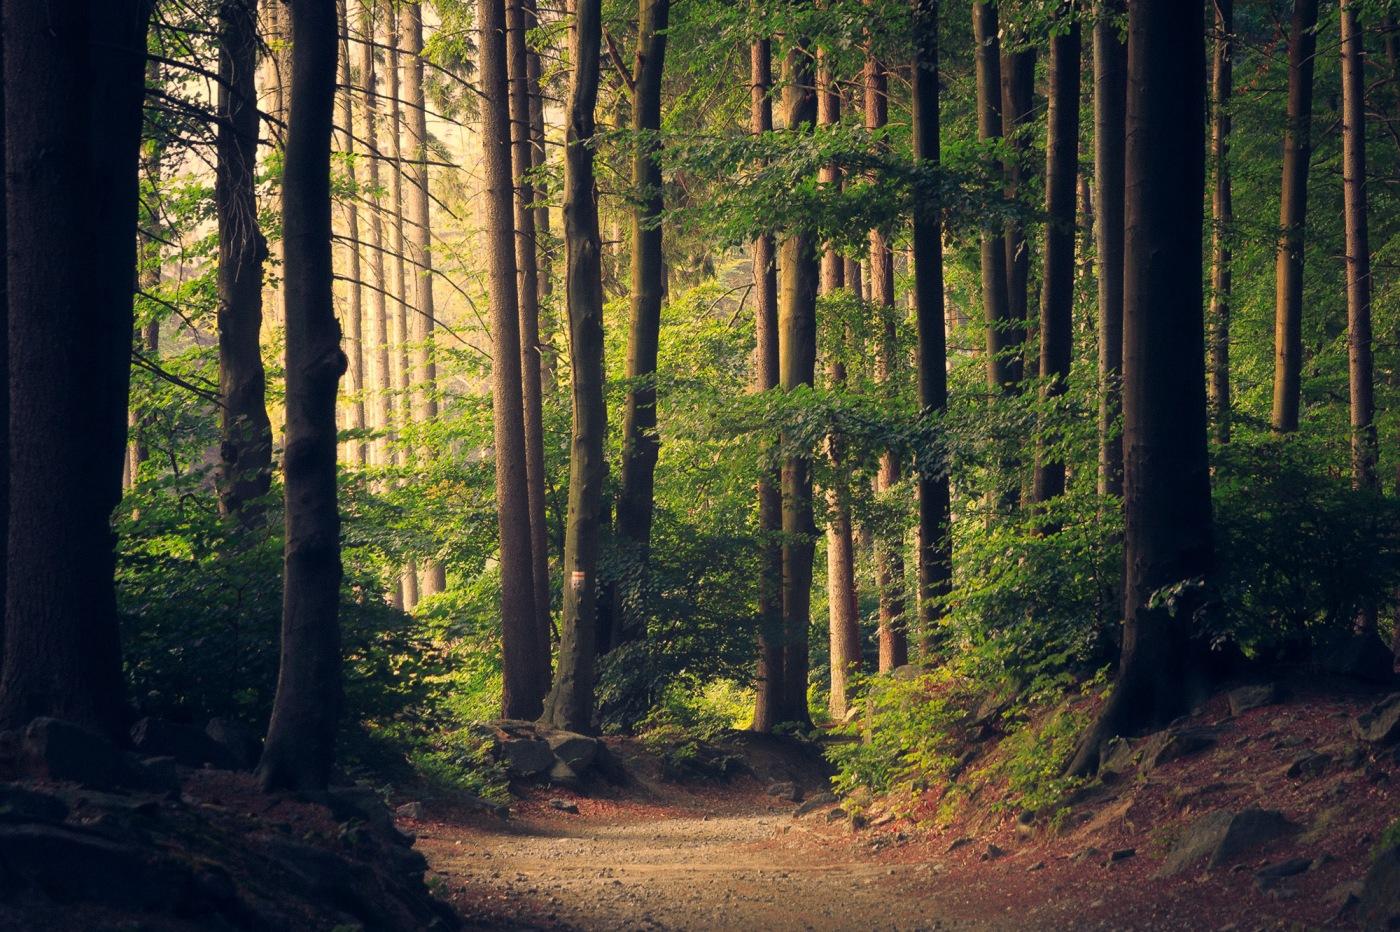 Temperate Forest Habitat and animals